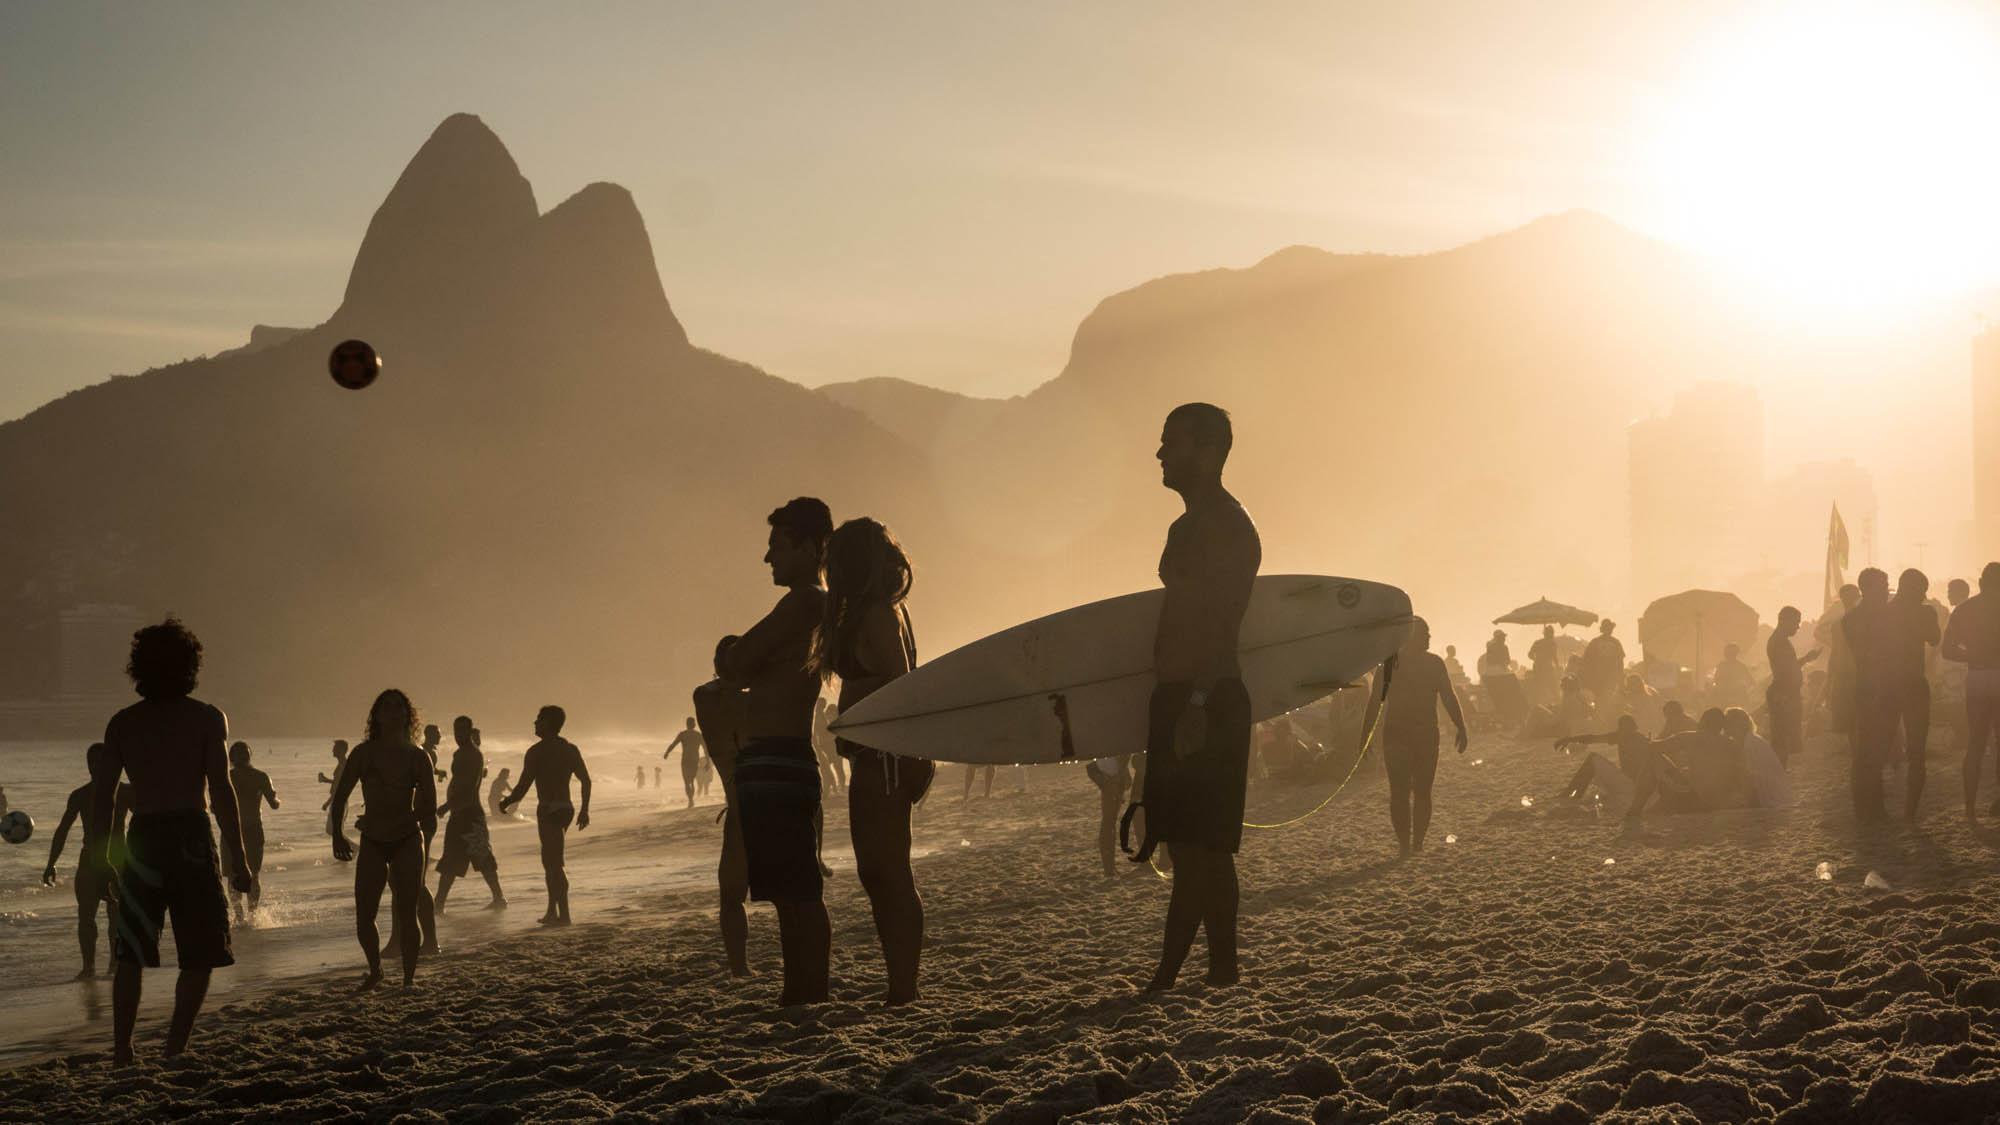 Surfer-sunset-16-9